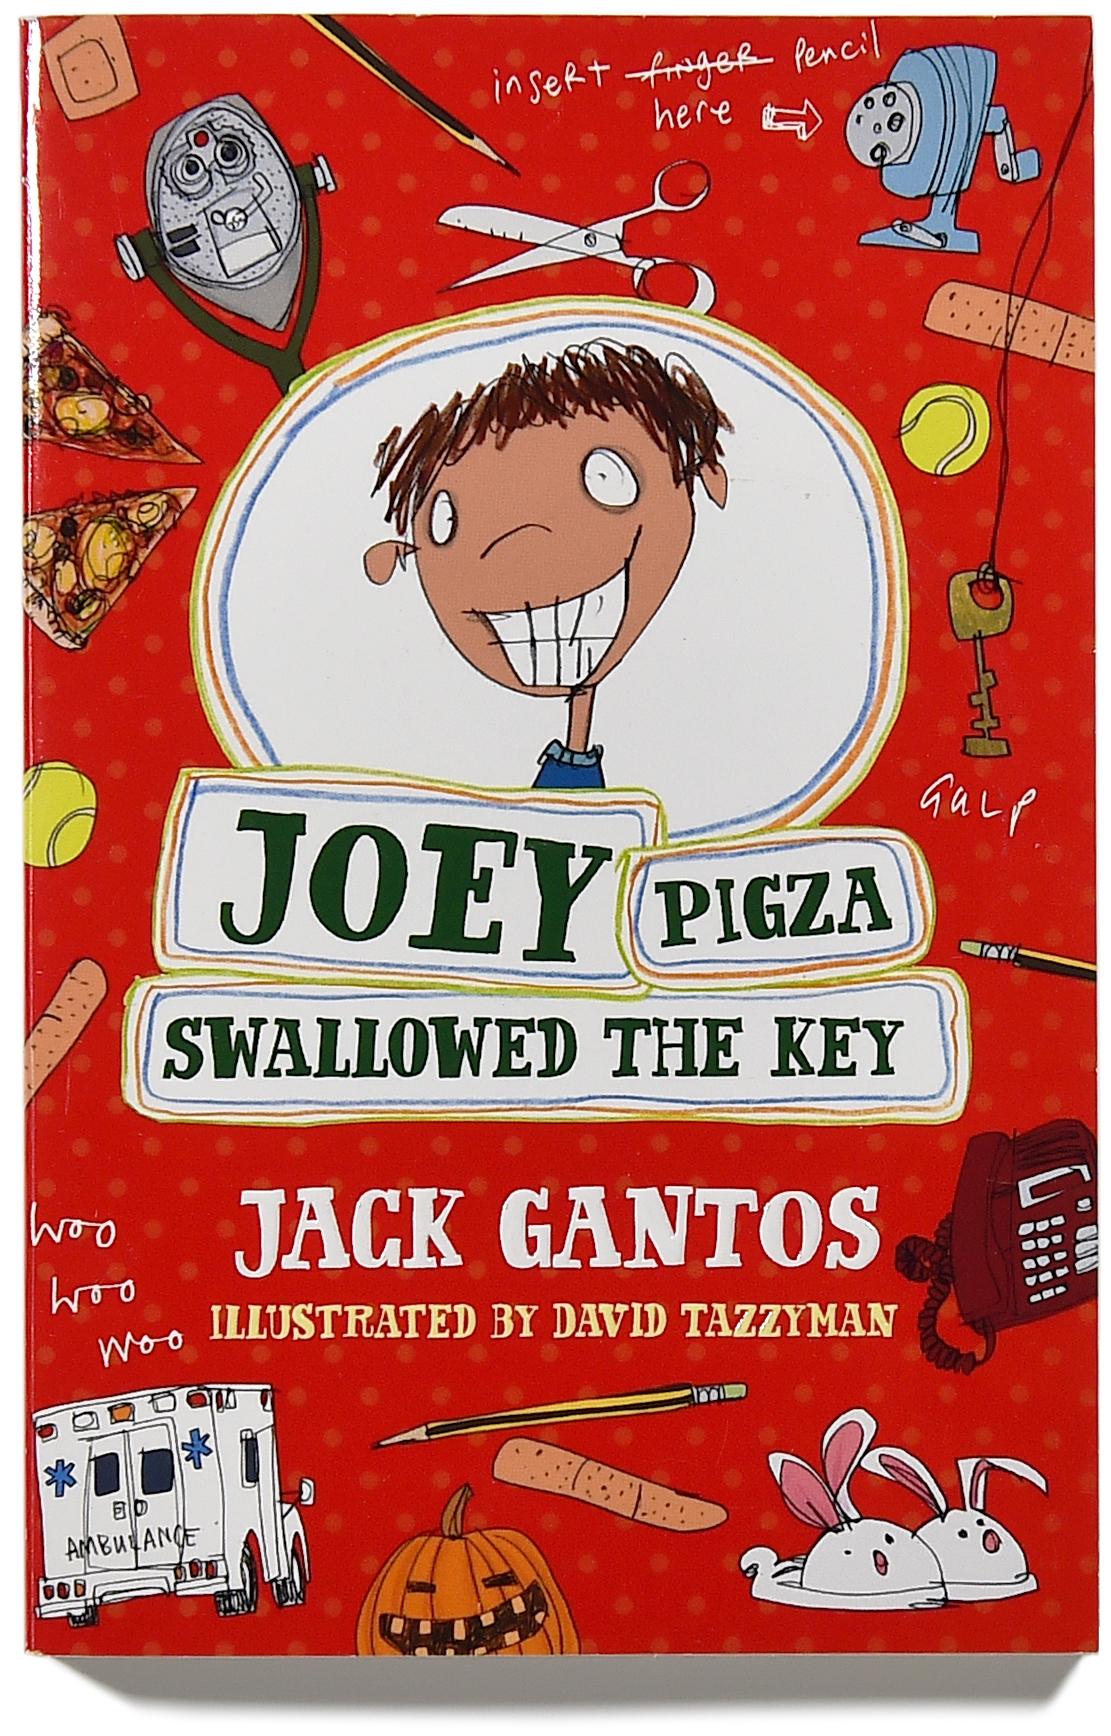 Joey Pigza series